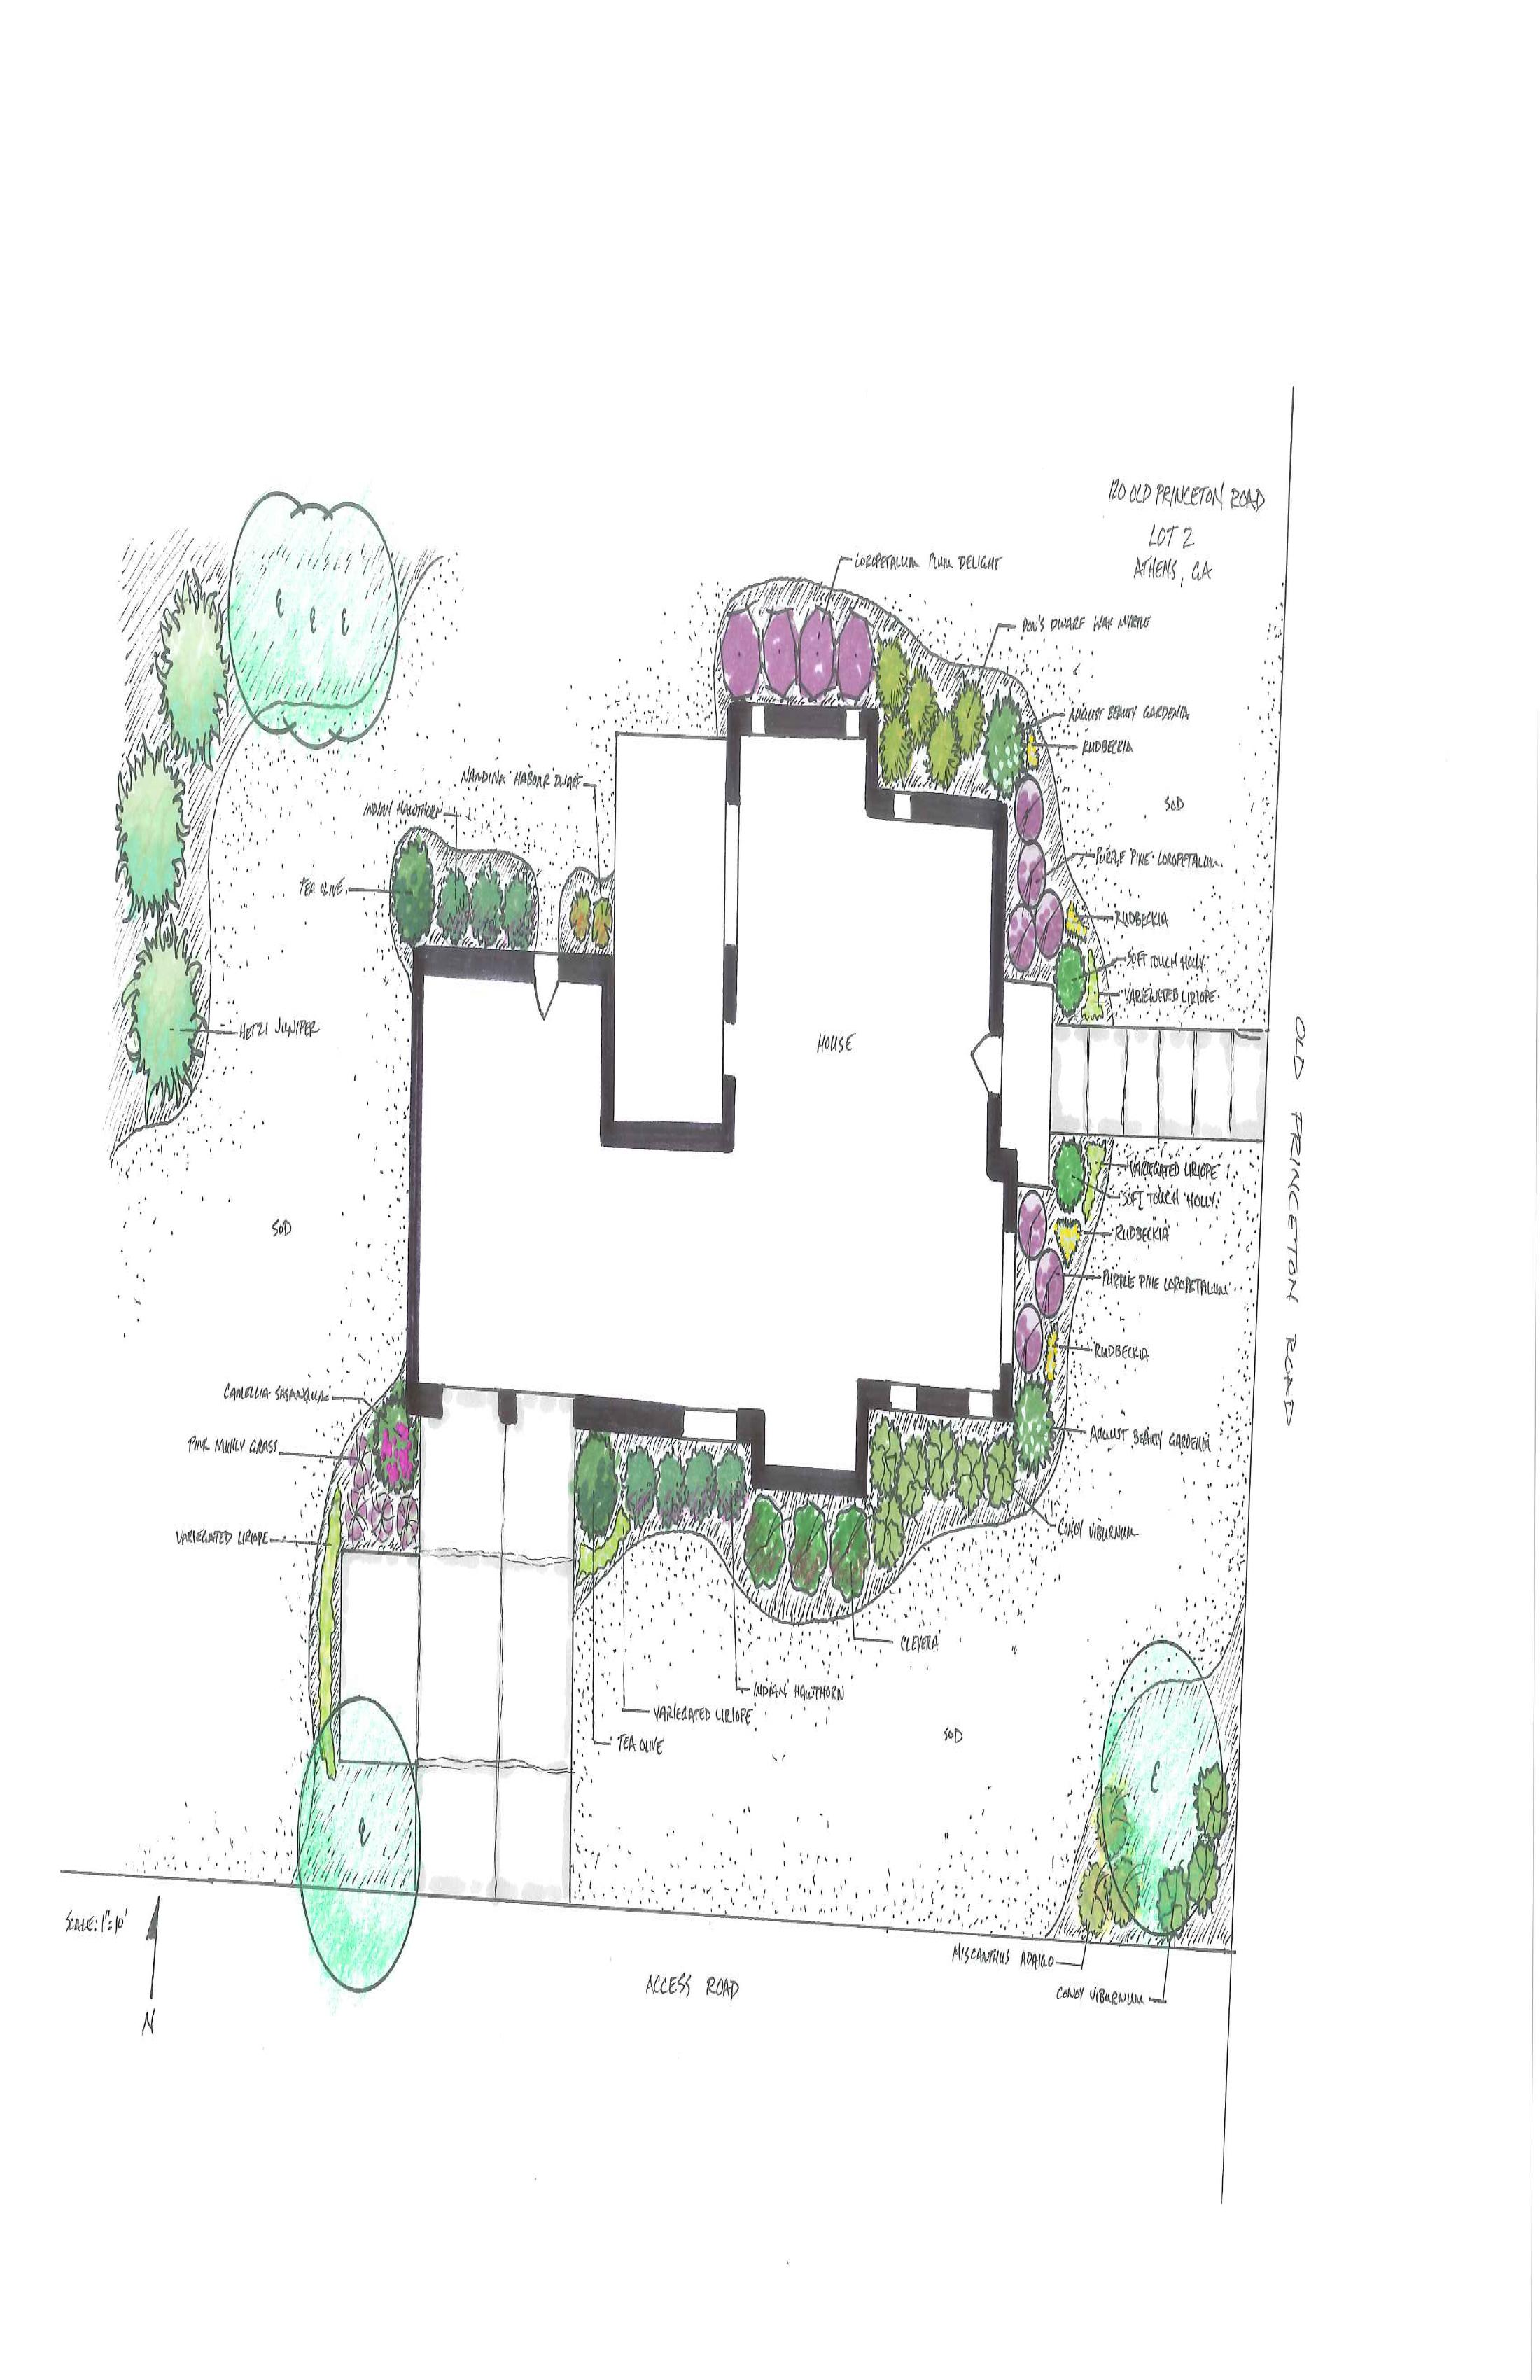 BradStephensHomes---Old-Princeton-plan